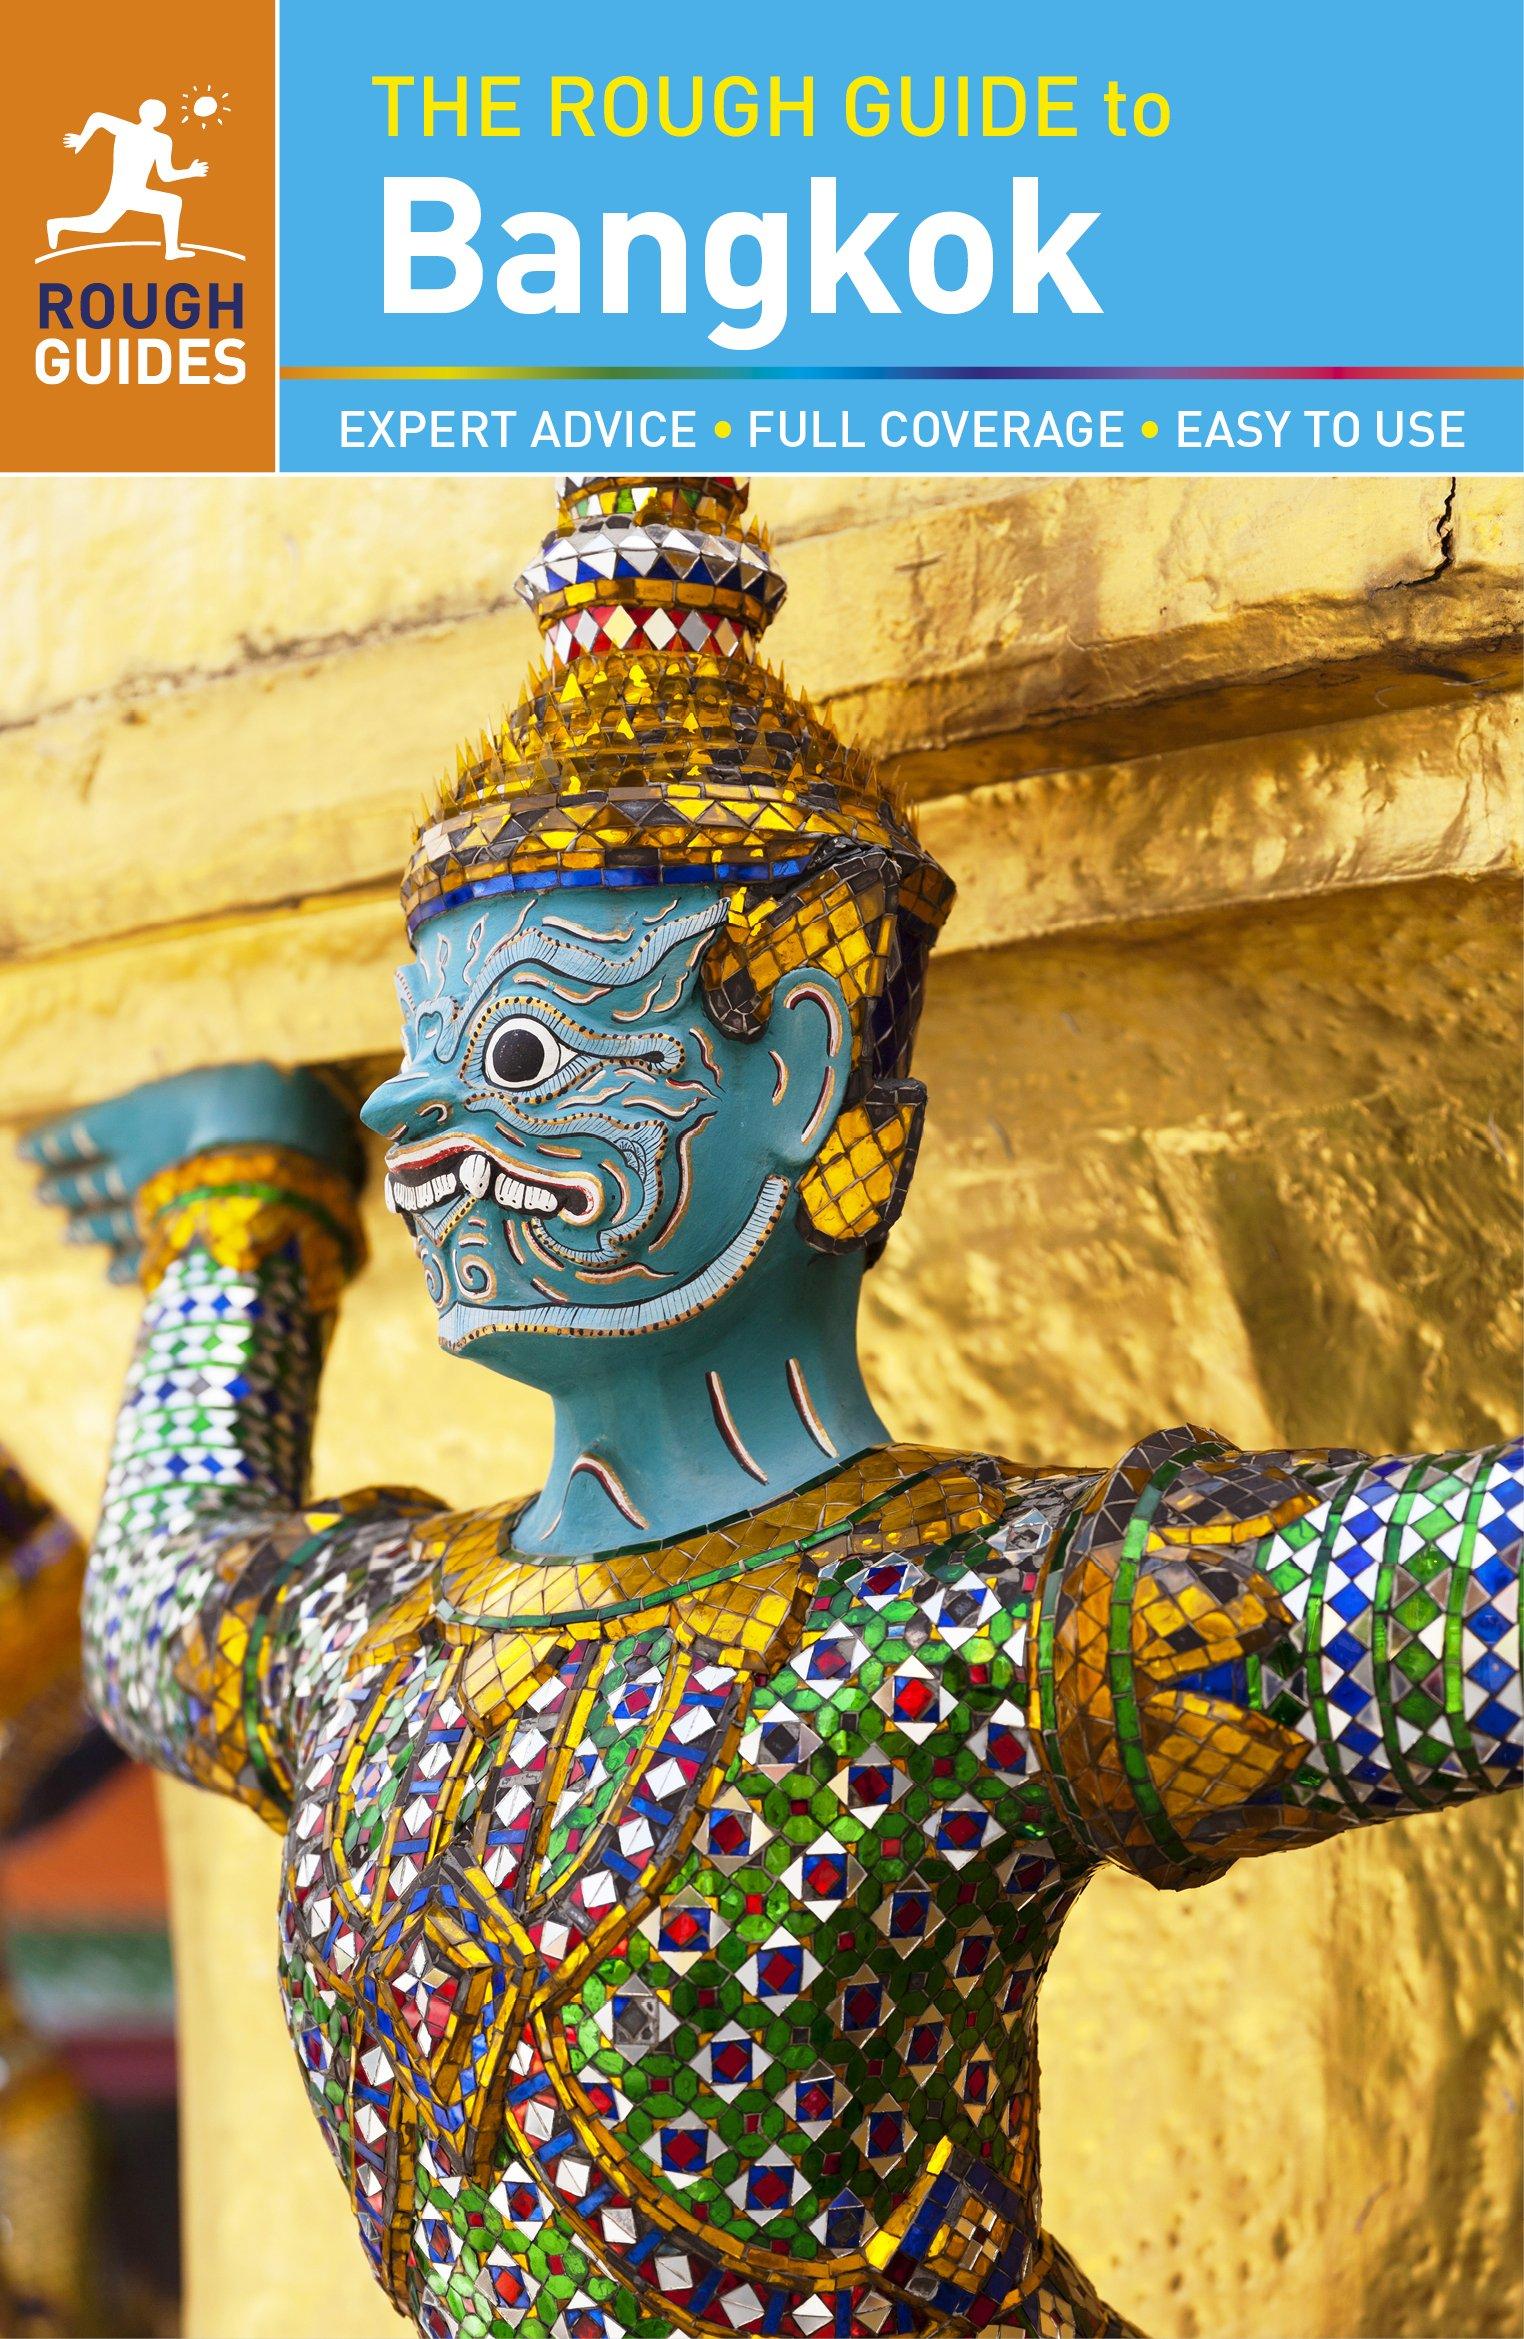 The Rough Guide to Bangkok (Rough Guides) PDF